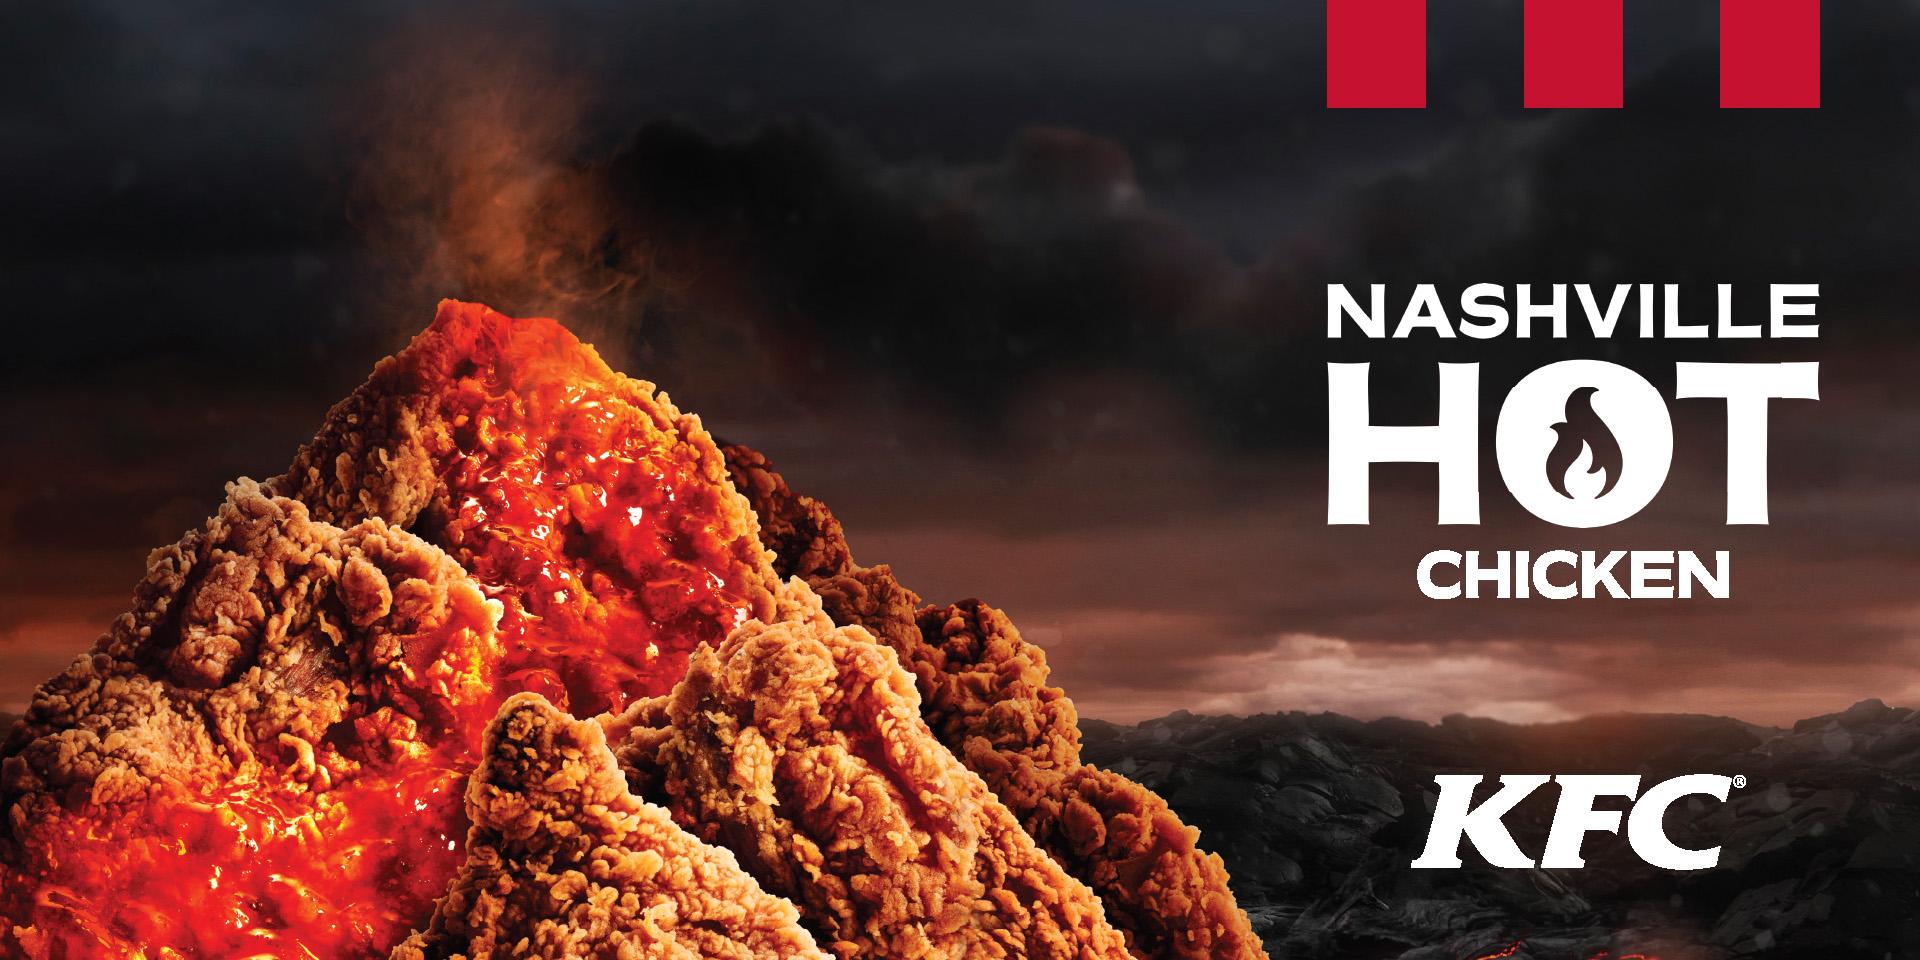 KFC1117 POD4 18' Nashville Hot OOH 6x3m @10%_F.jpg